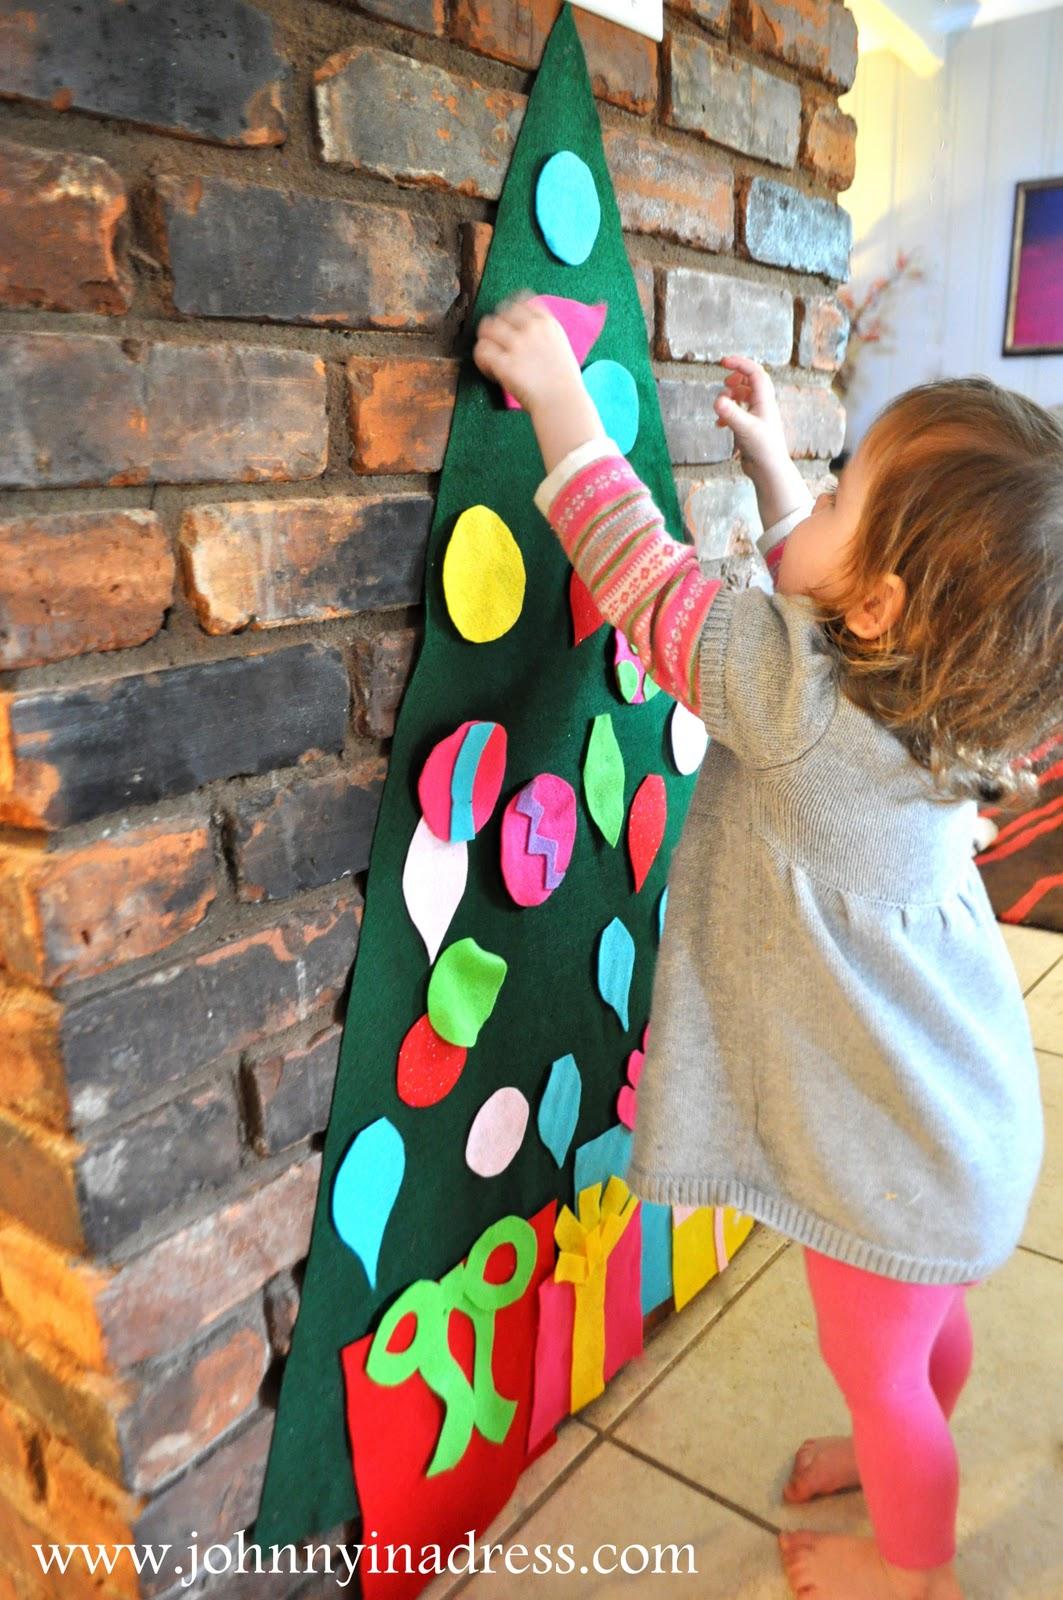 Johnny In A Dress: Play Felt Tree & Ornaments